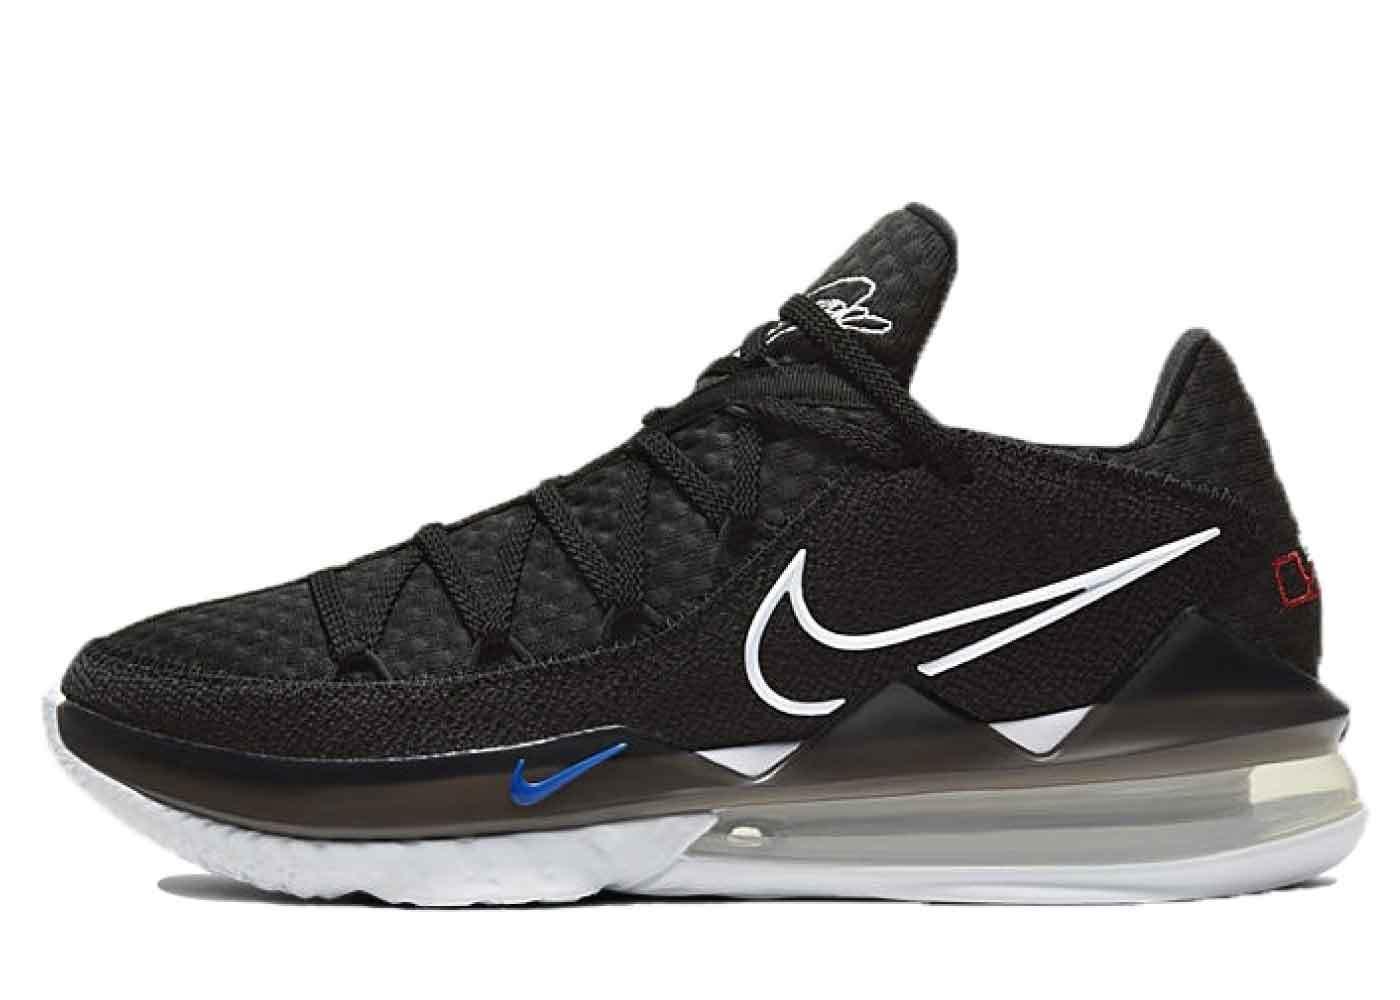 Nike LeBron 17 Low Black Multiの写真